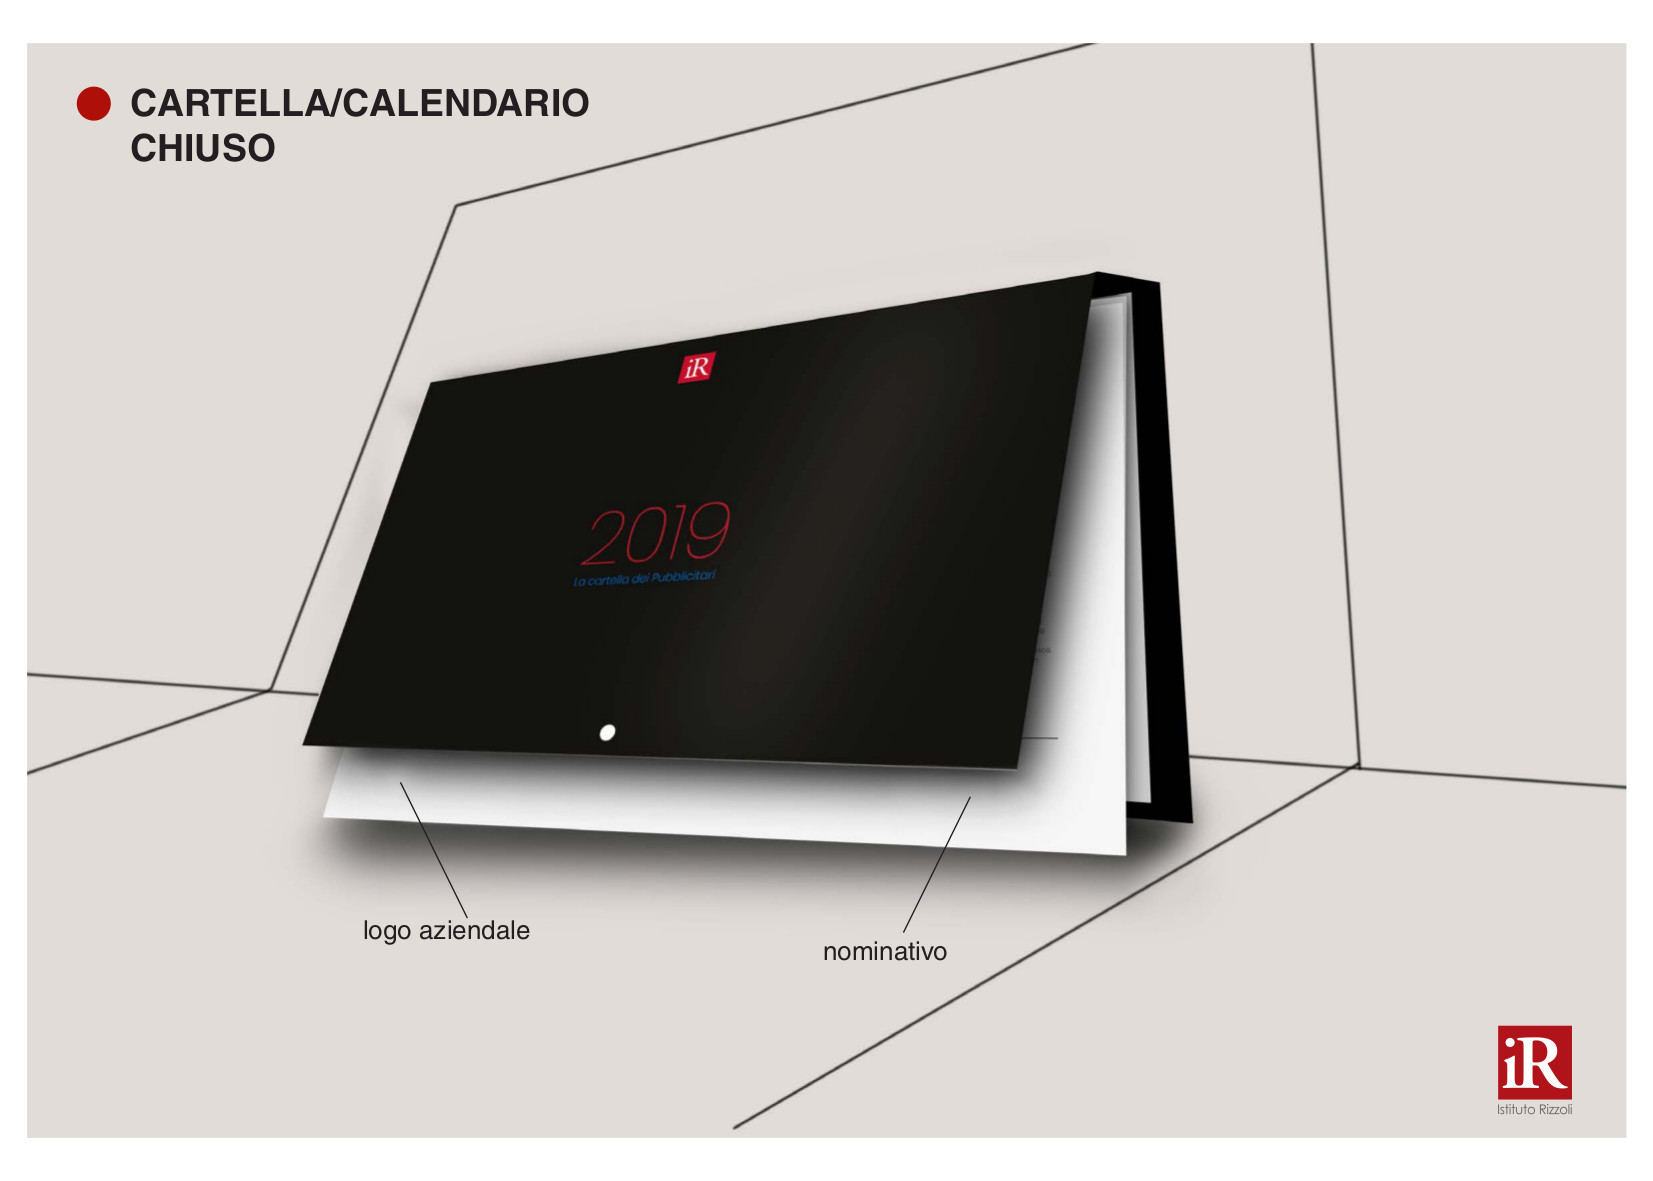 calendario 2019 cartella IR